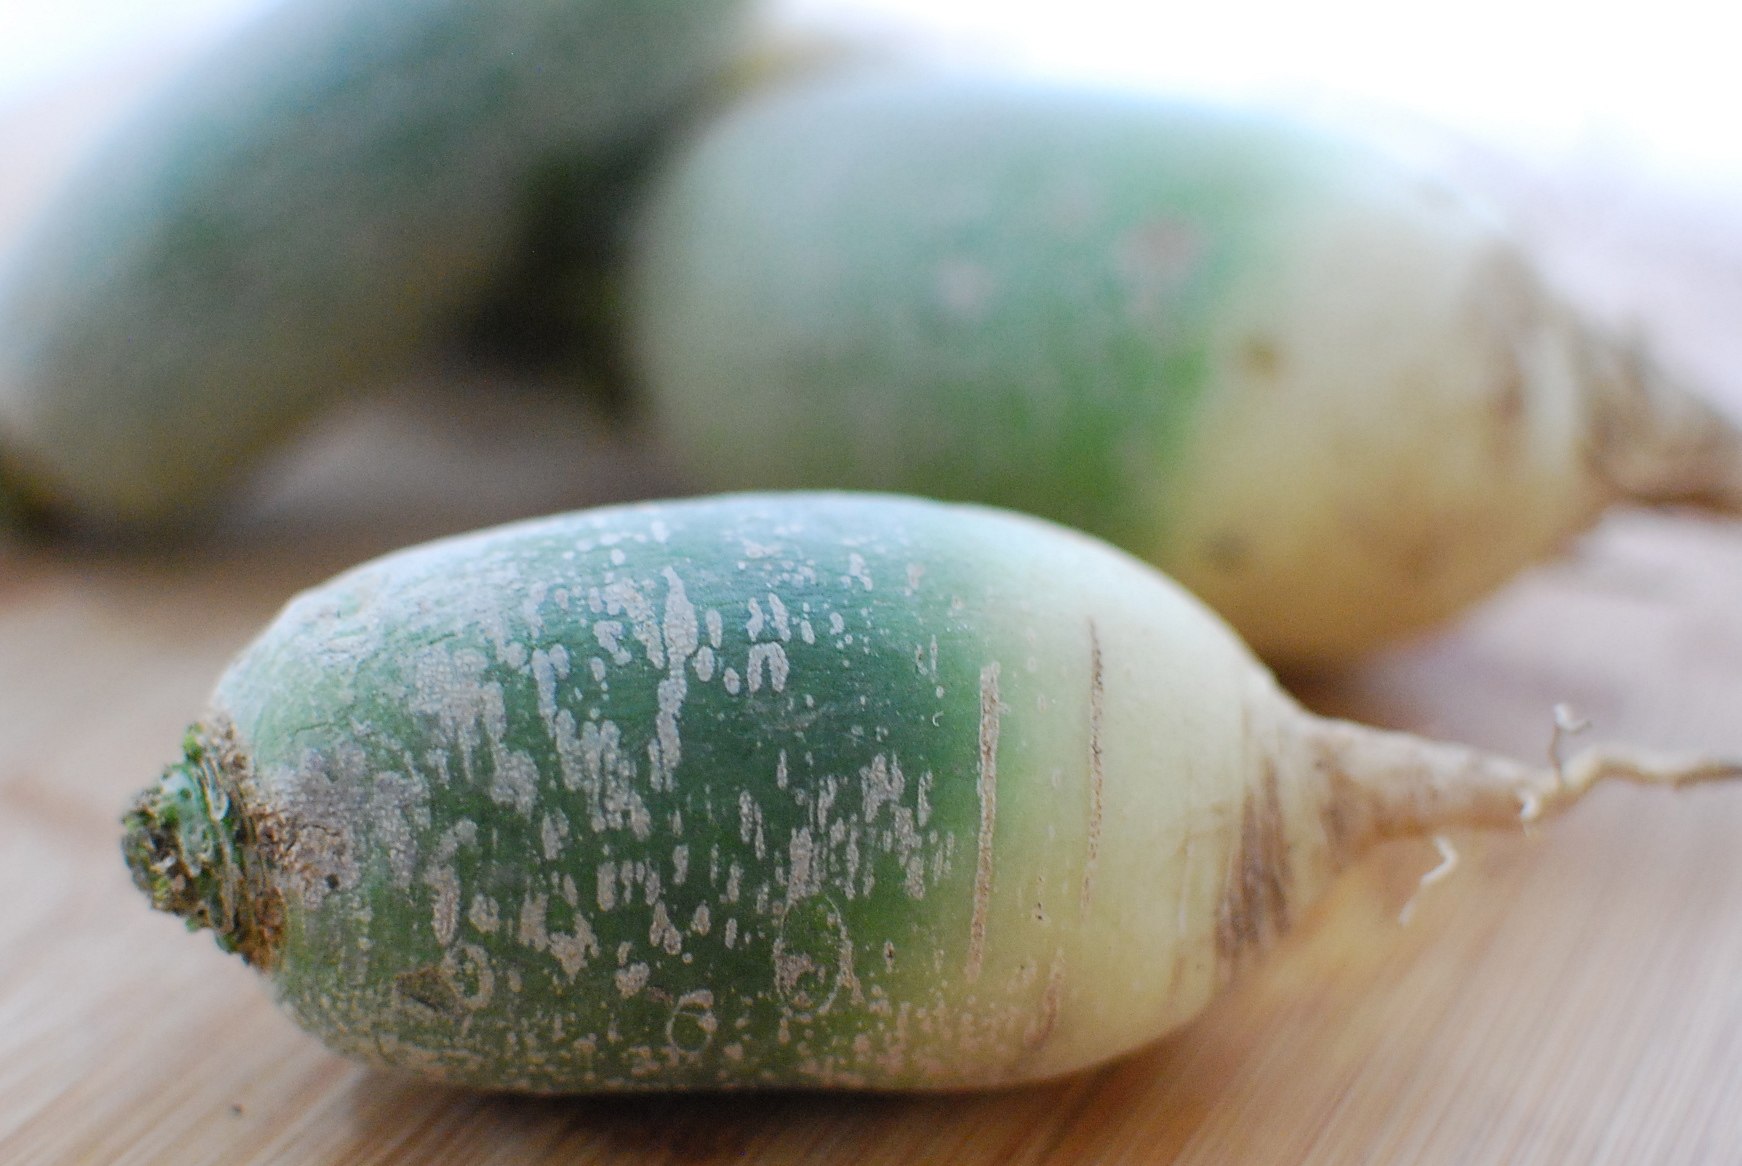 how to prepare radish greens